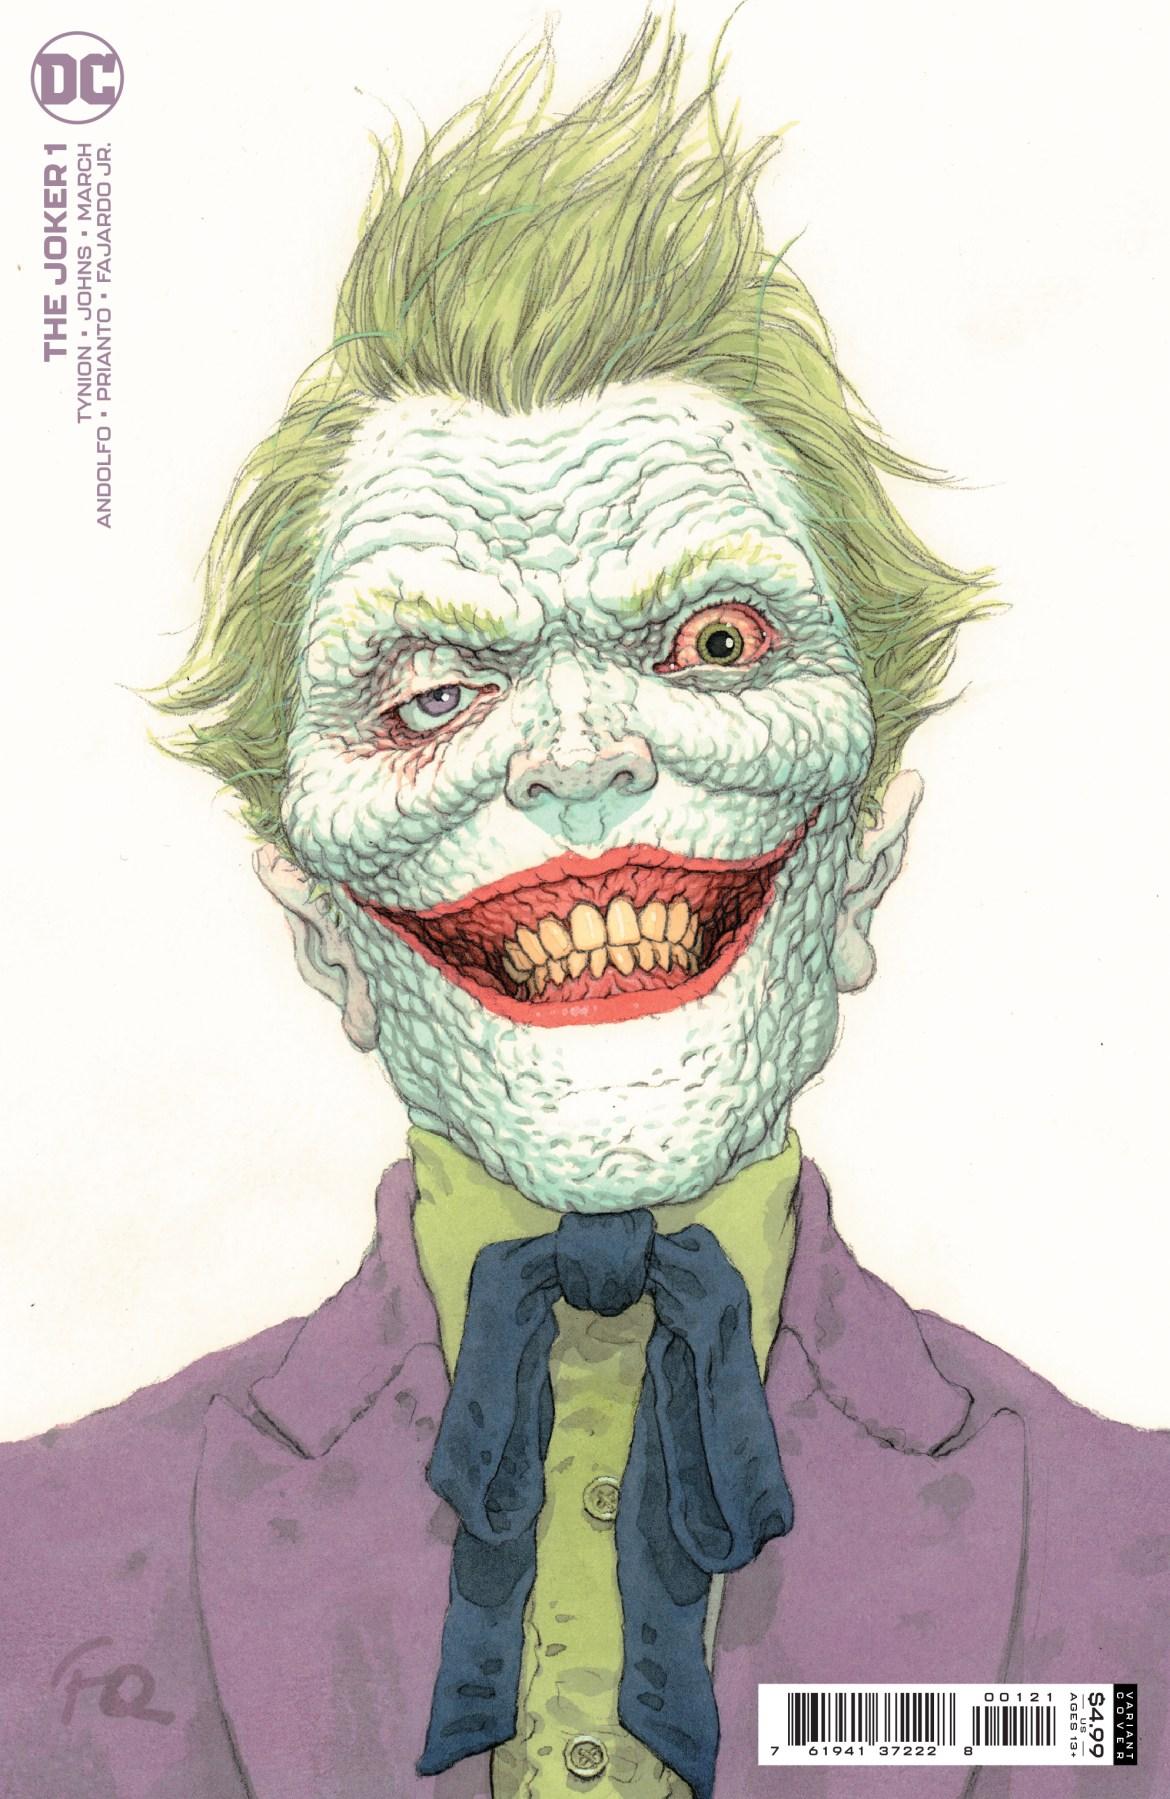 0121DC008 ComicList: DC Comics New Releases for 03/10/2021